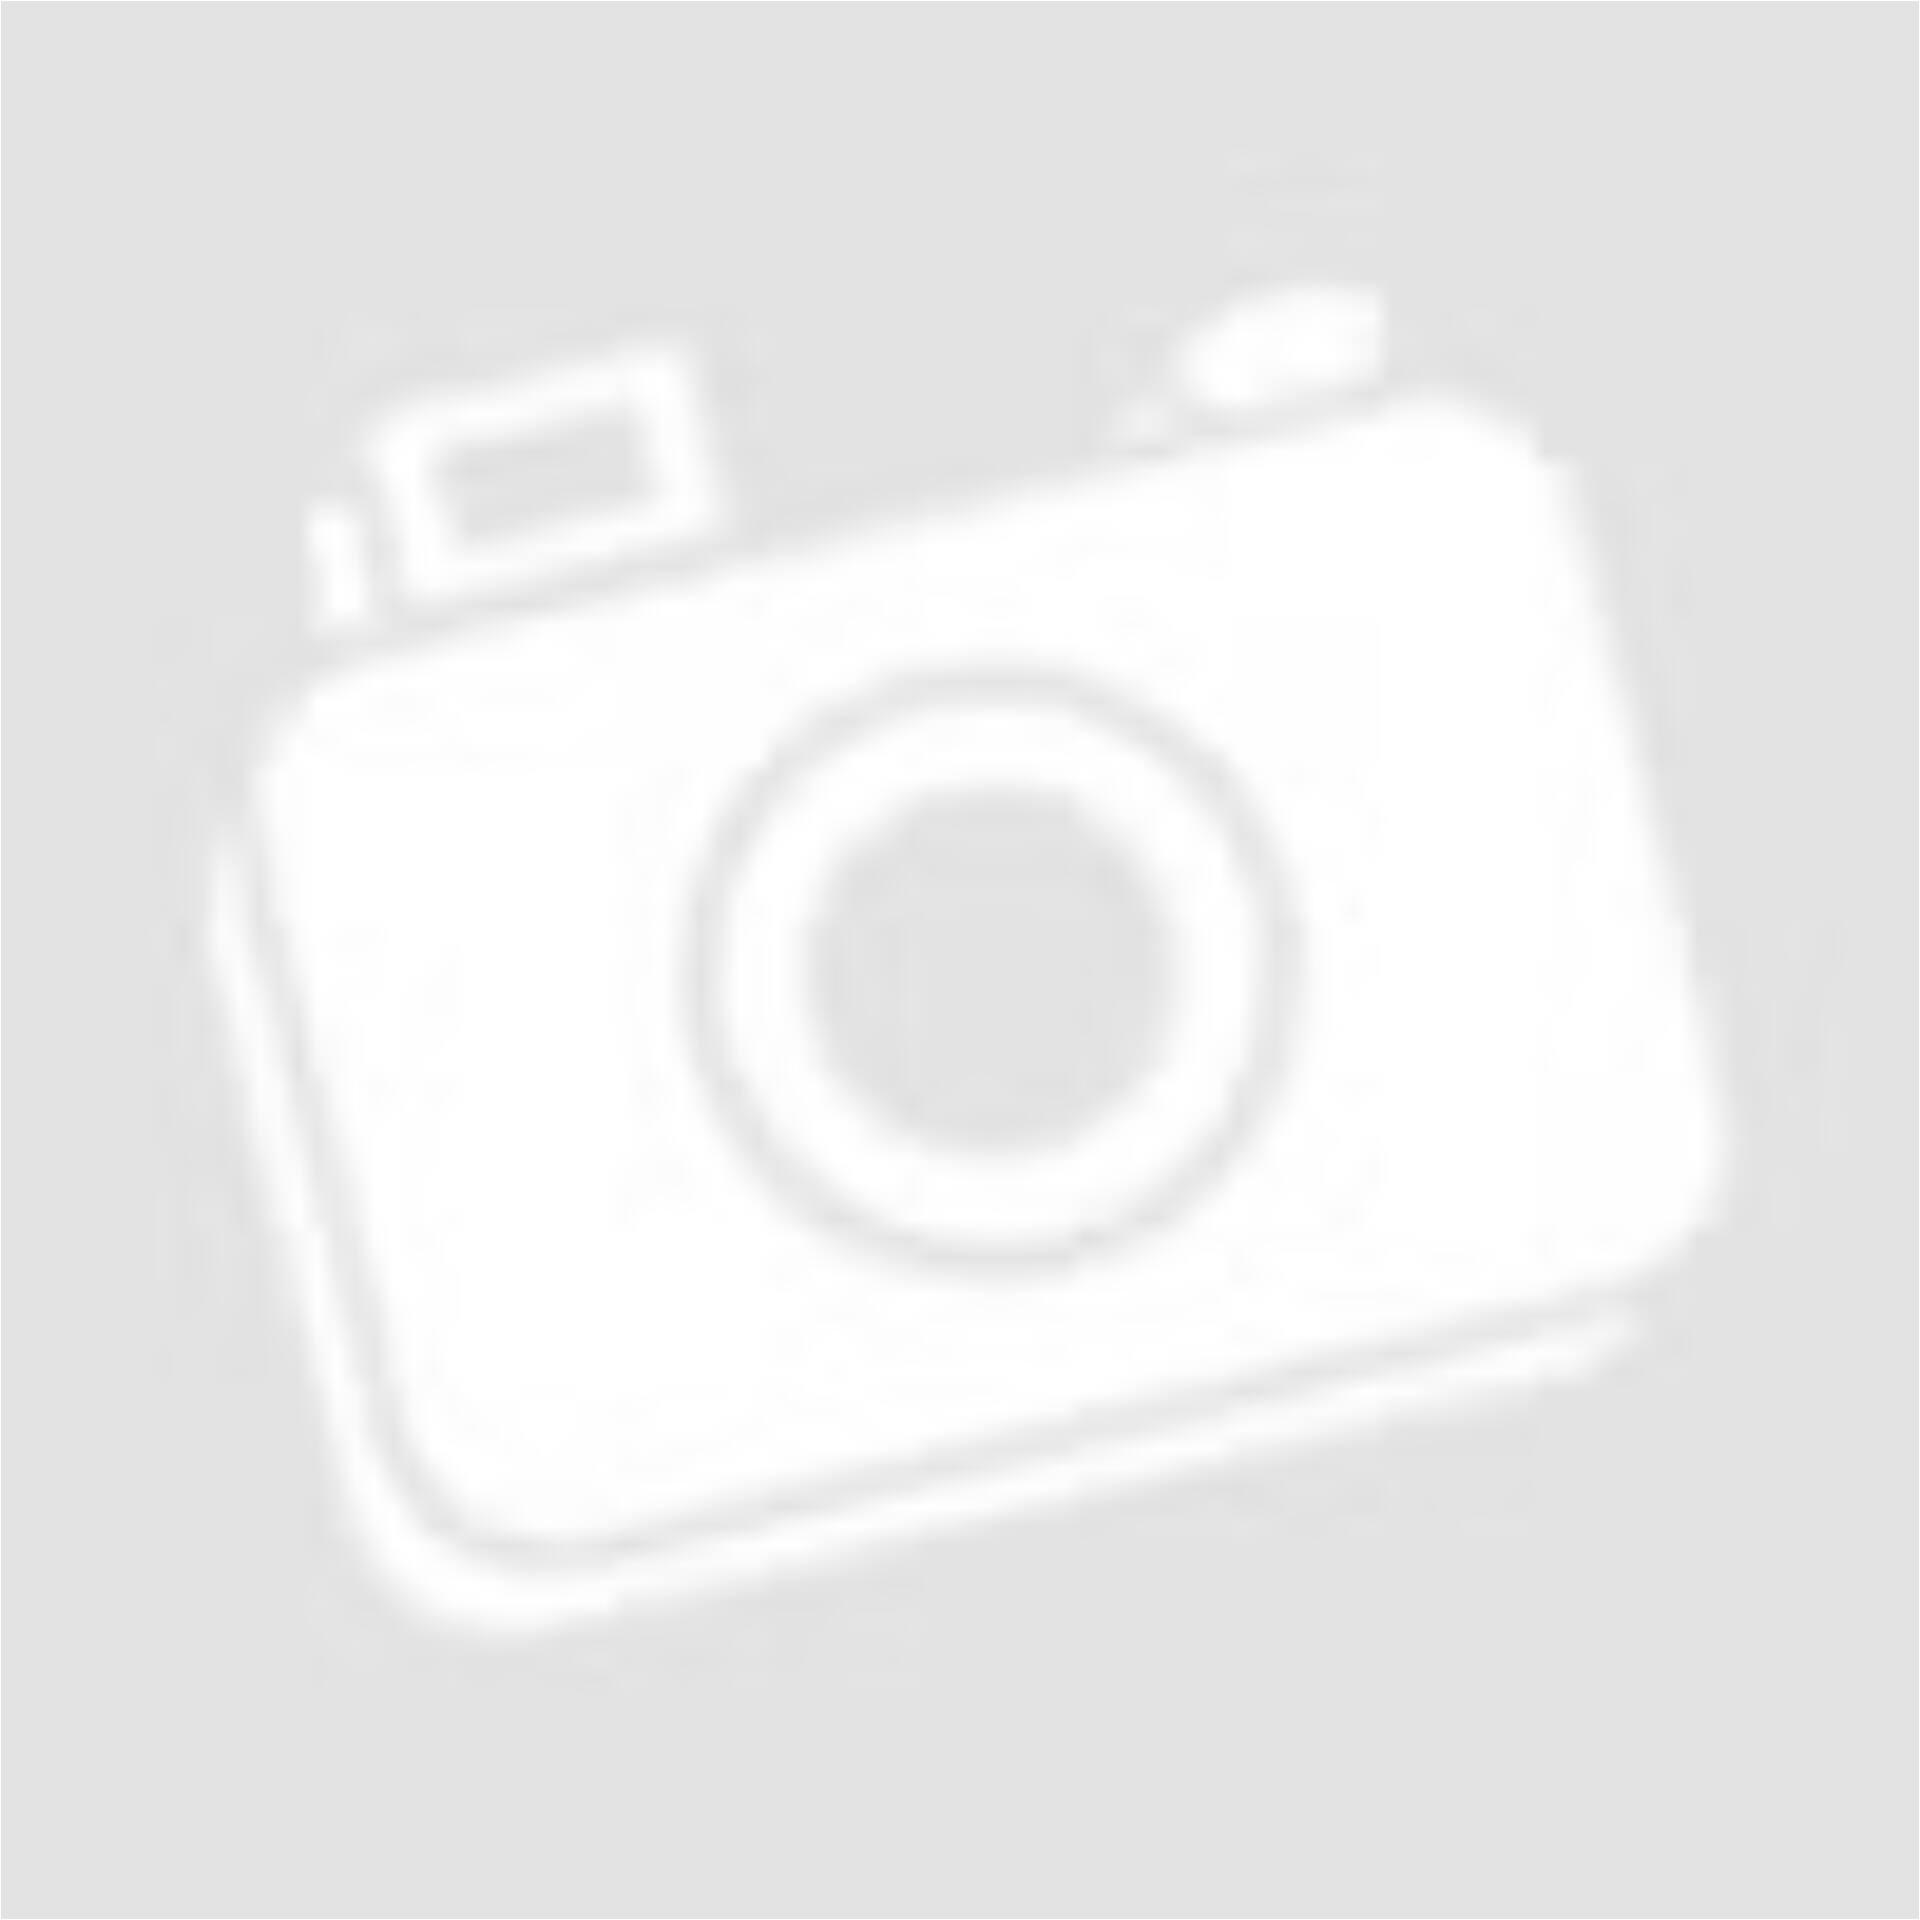 Fekete színű Yessica pulóver (Méret  M) - Női pulóver 6a7ce21f2d